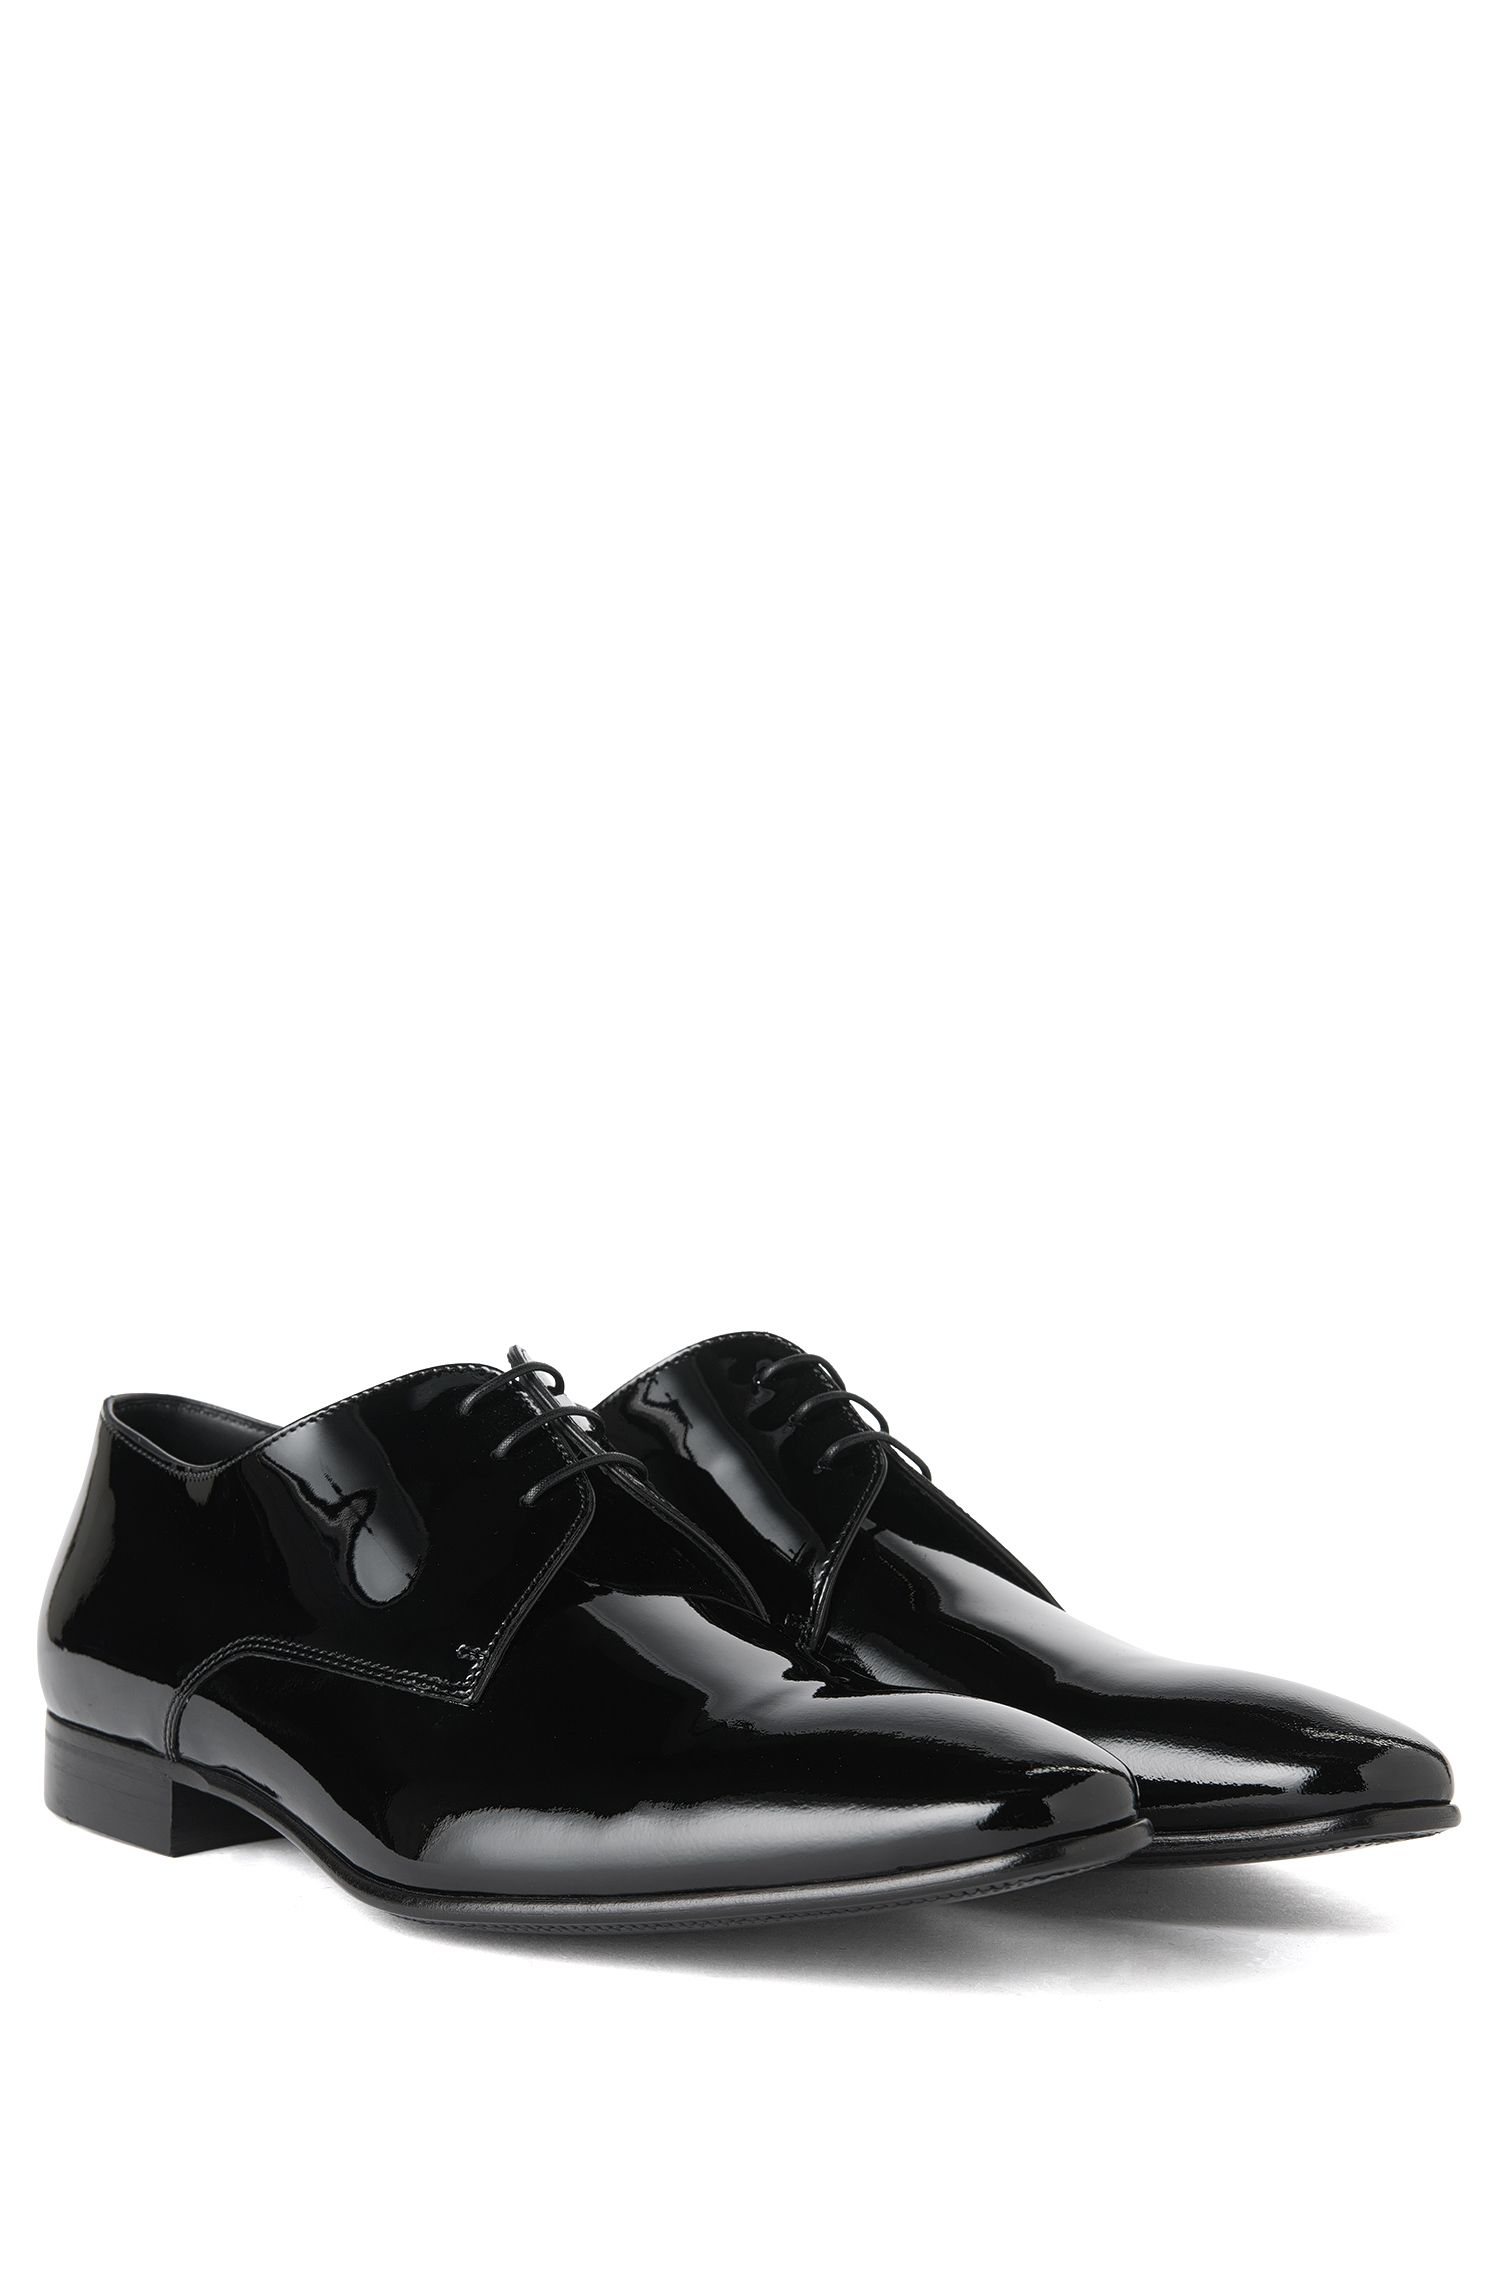 'Cristallo'   Italian Calfskin Patent Derby Tuxedo Shoes